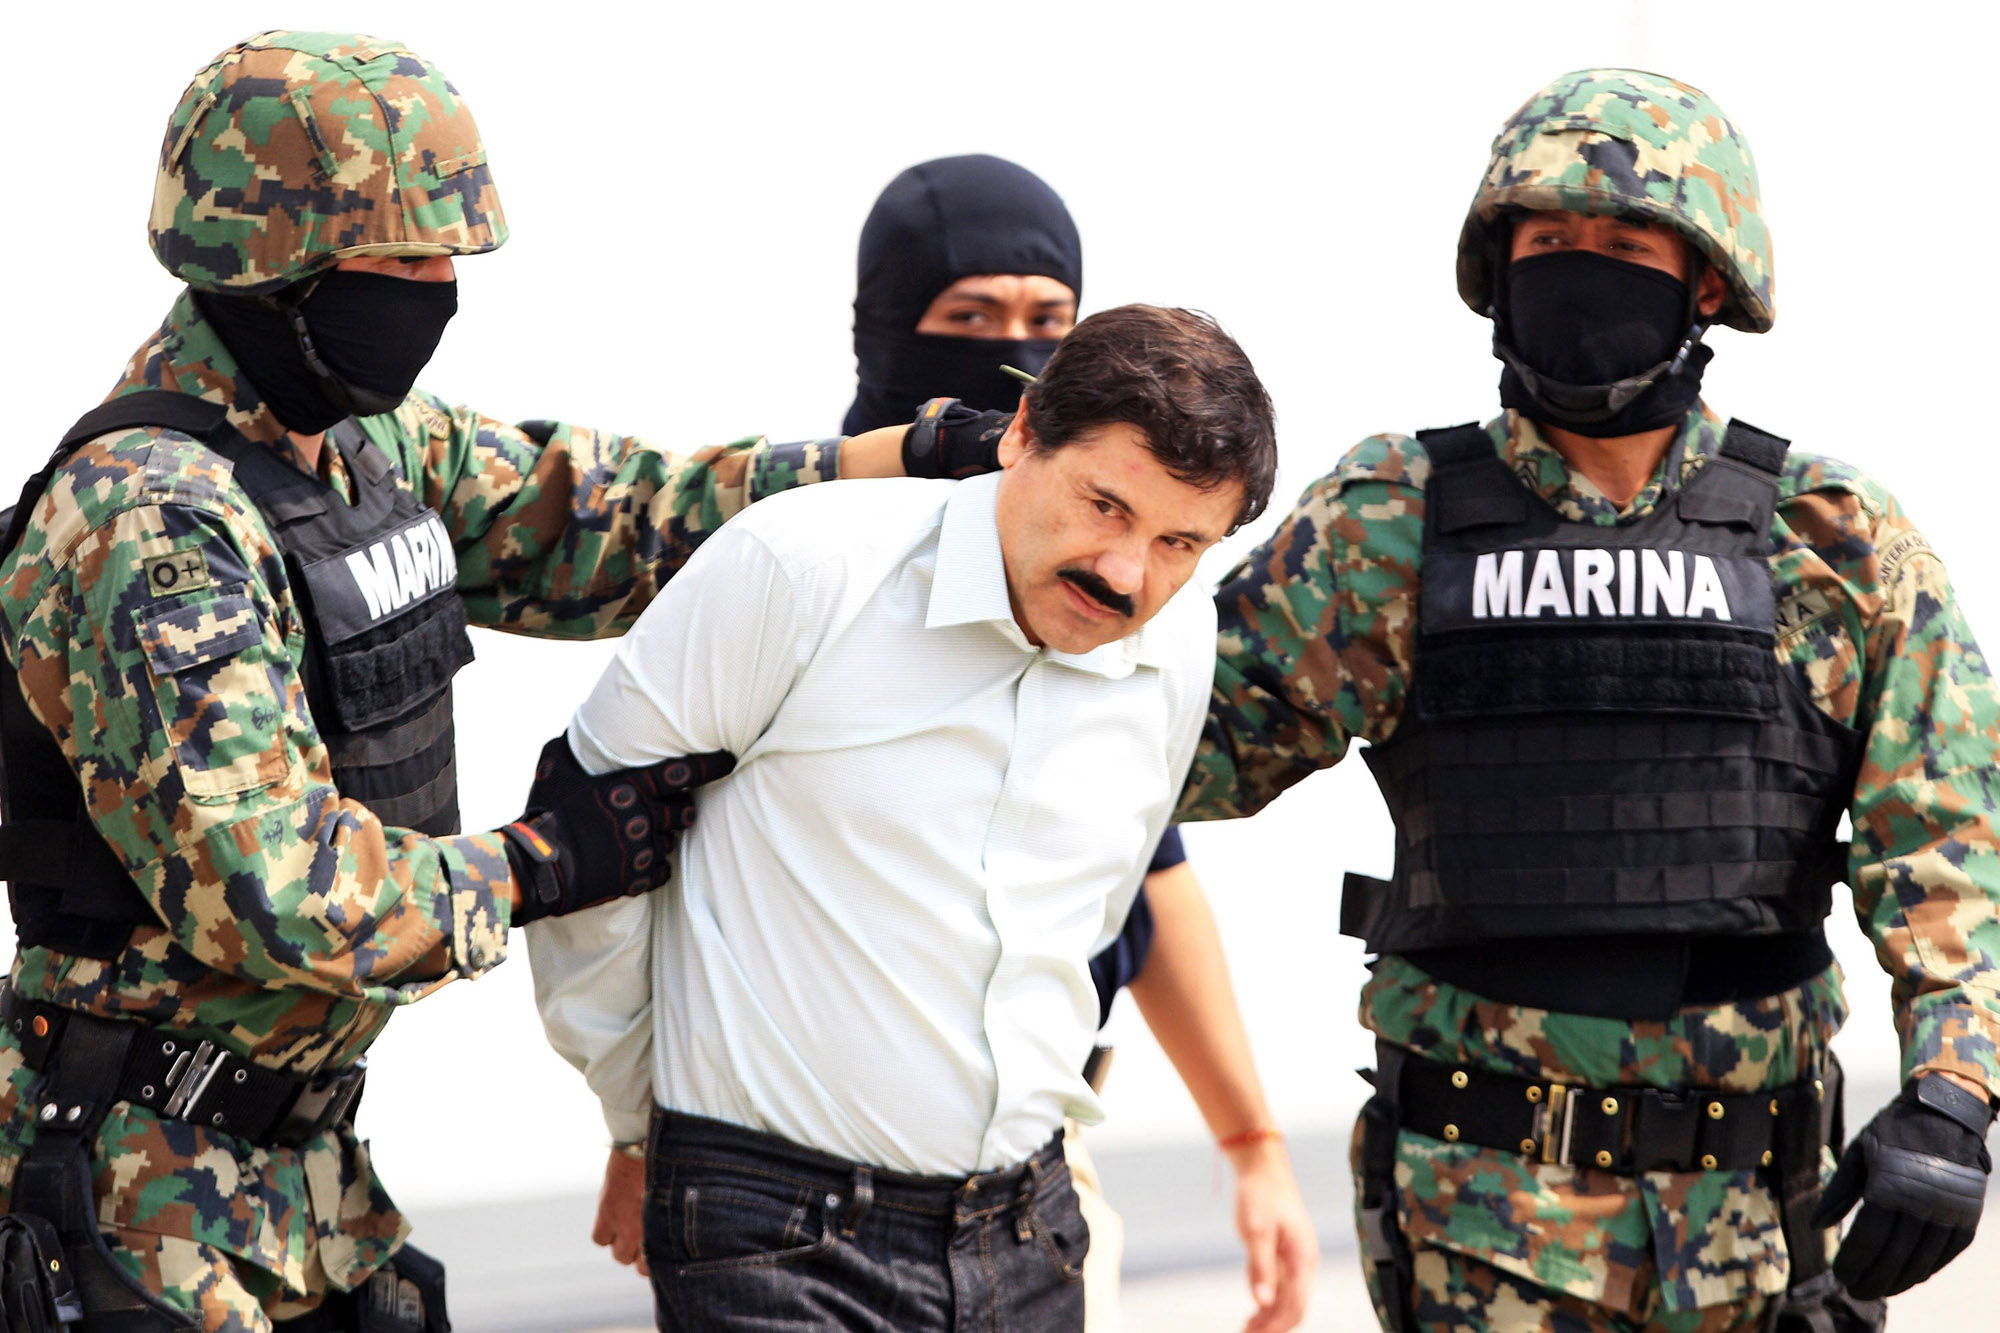 Ridley Scott to Direct El Chapo-Inspired Drug War Drama 'The Cartel'